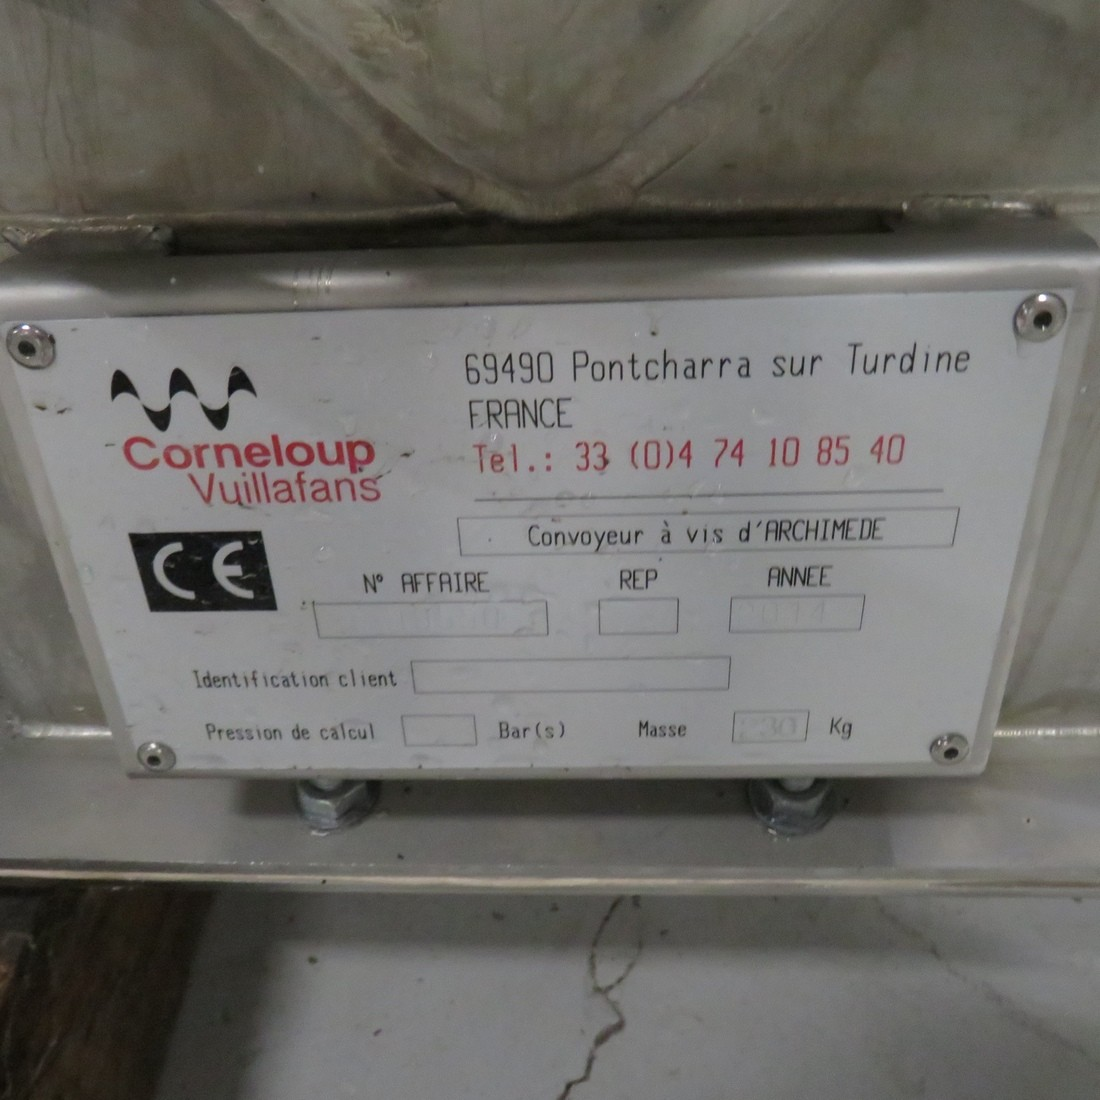 R4S1086 CORNELOUP Stainless steel screw Ø 200--length 3100 mm